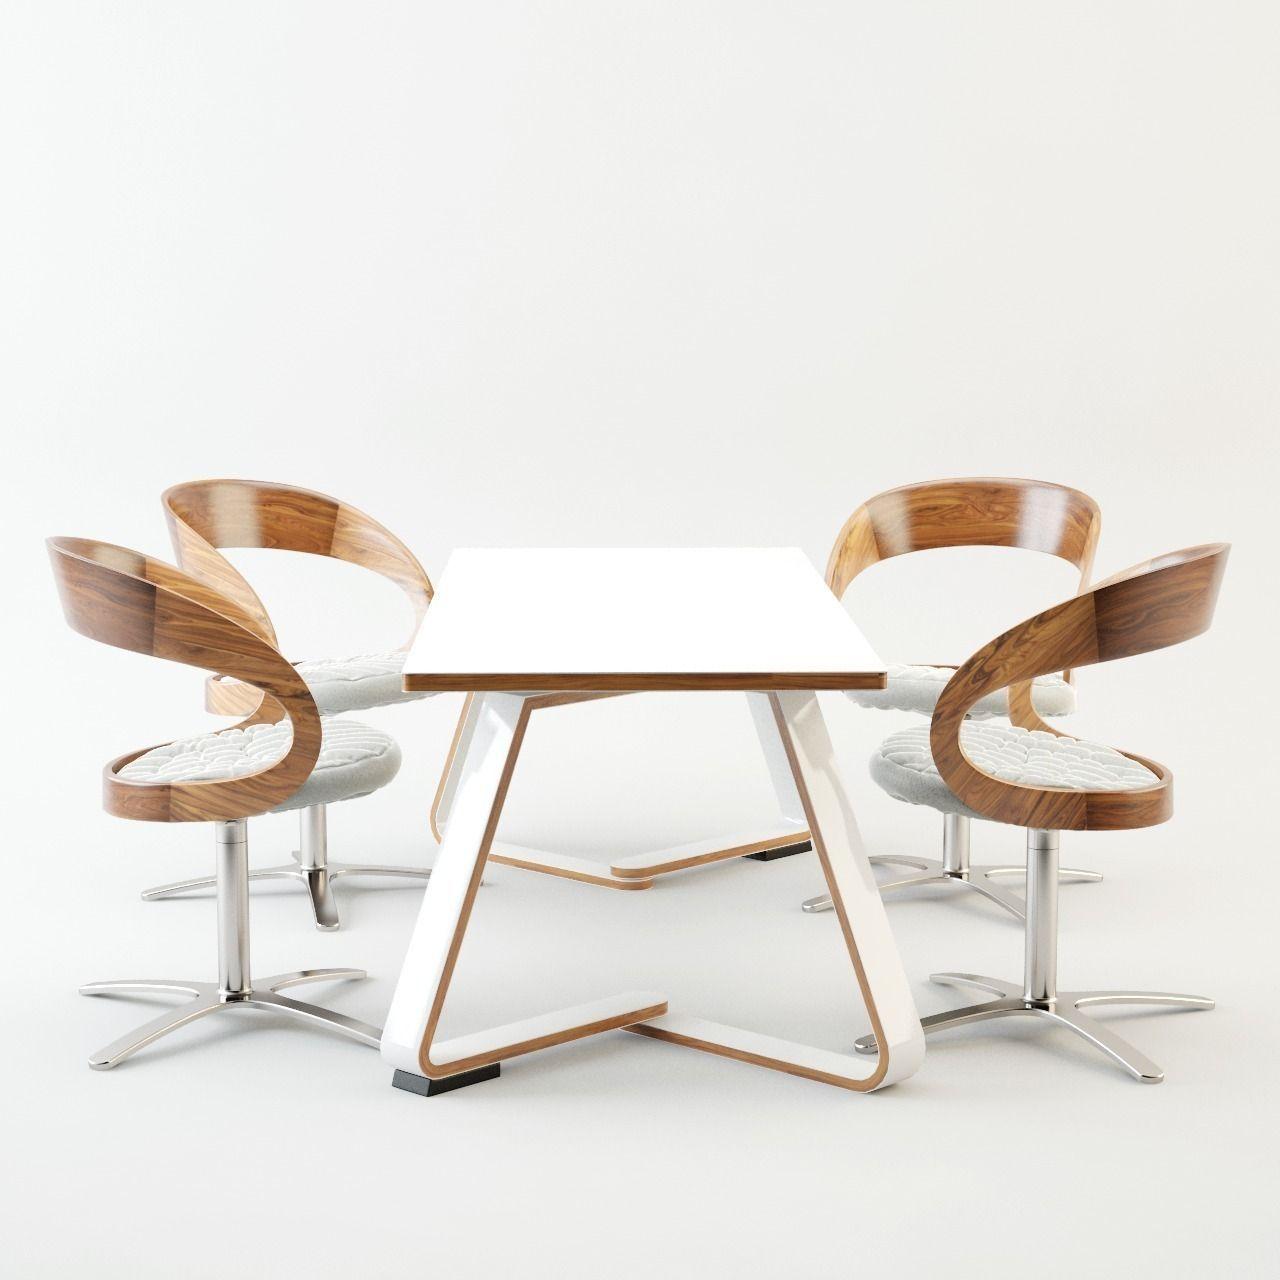 Dining table set 3d model obj fbx ma mb for New model dining table